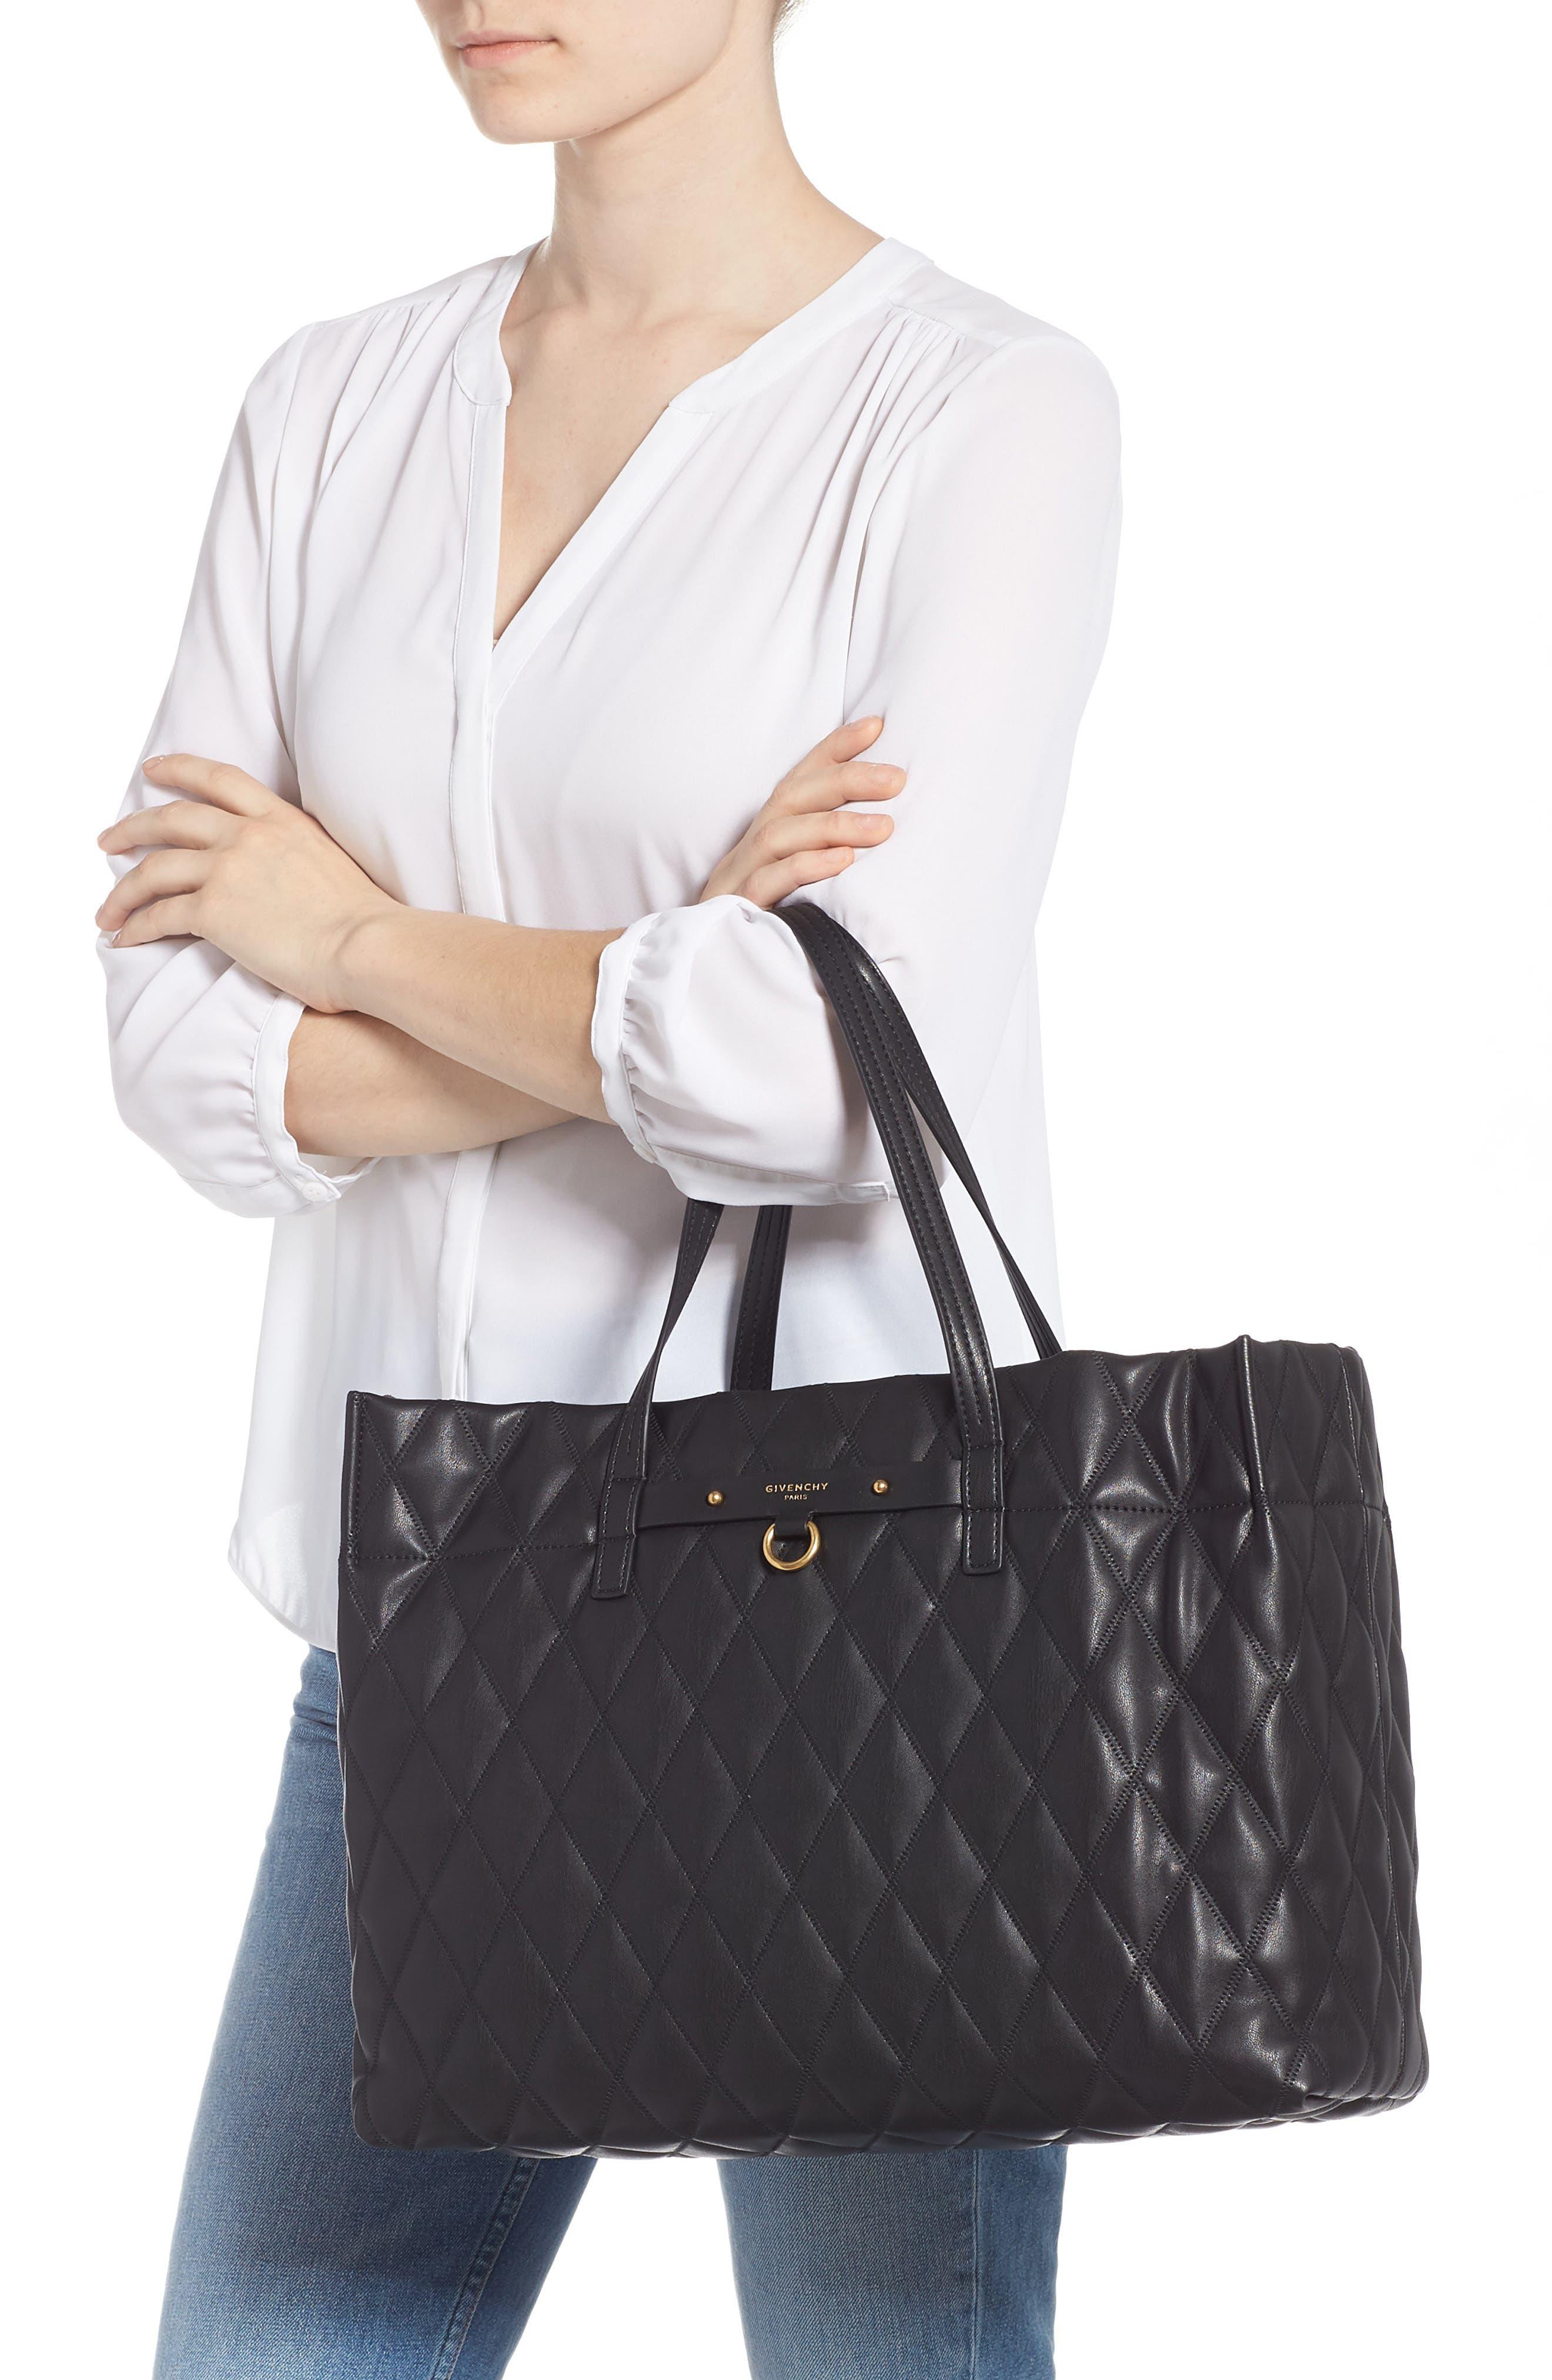 c223a5032264 Women's Faux Leather Designer Handbags & Wallets | Nordstrom